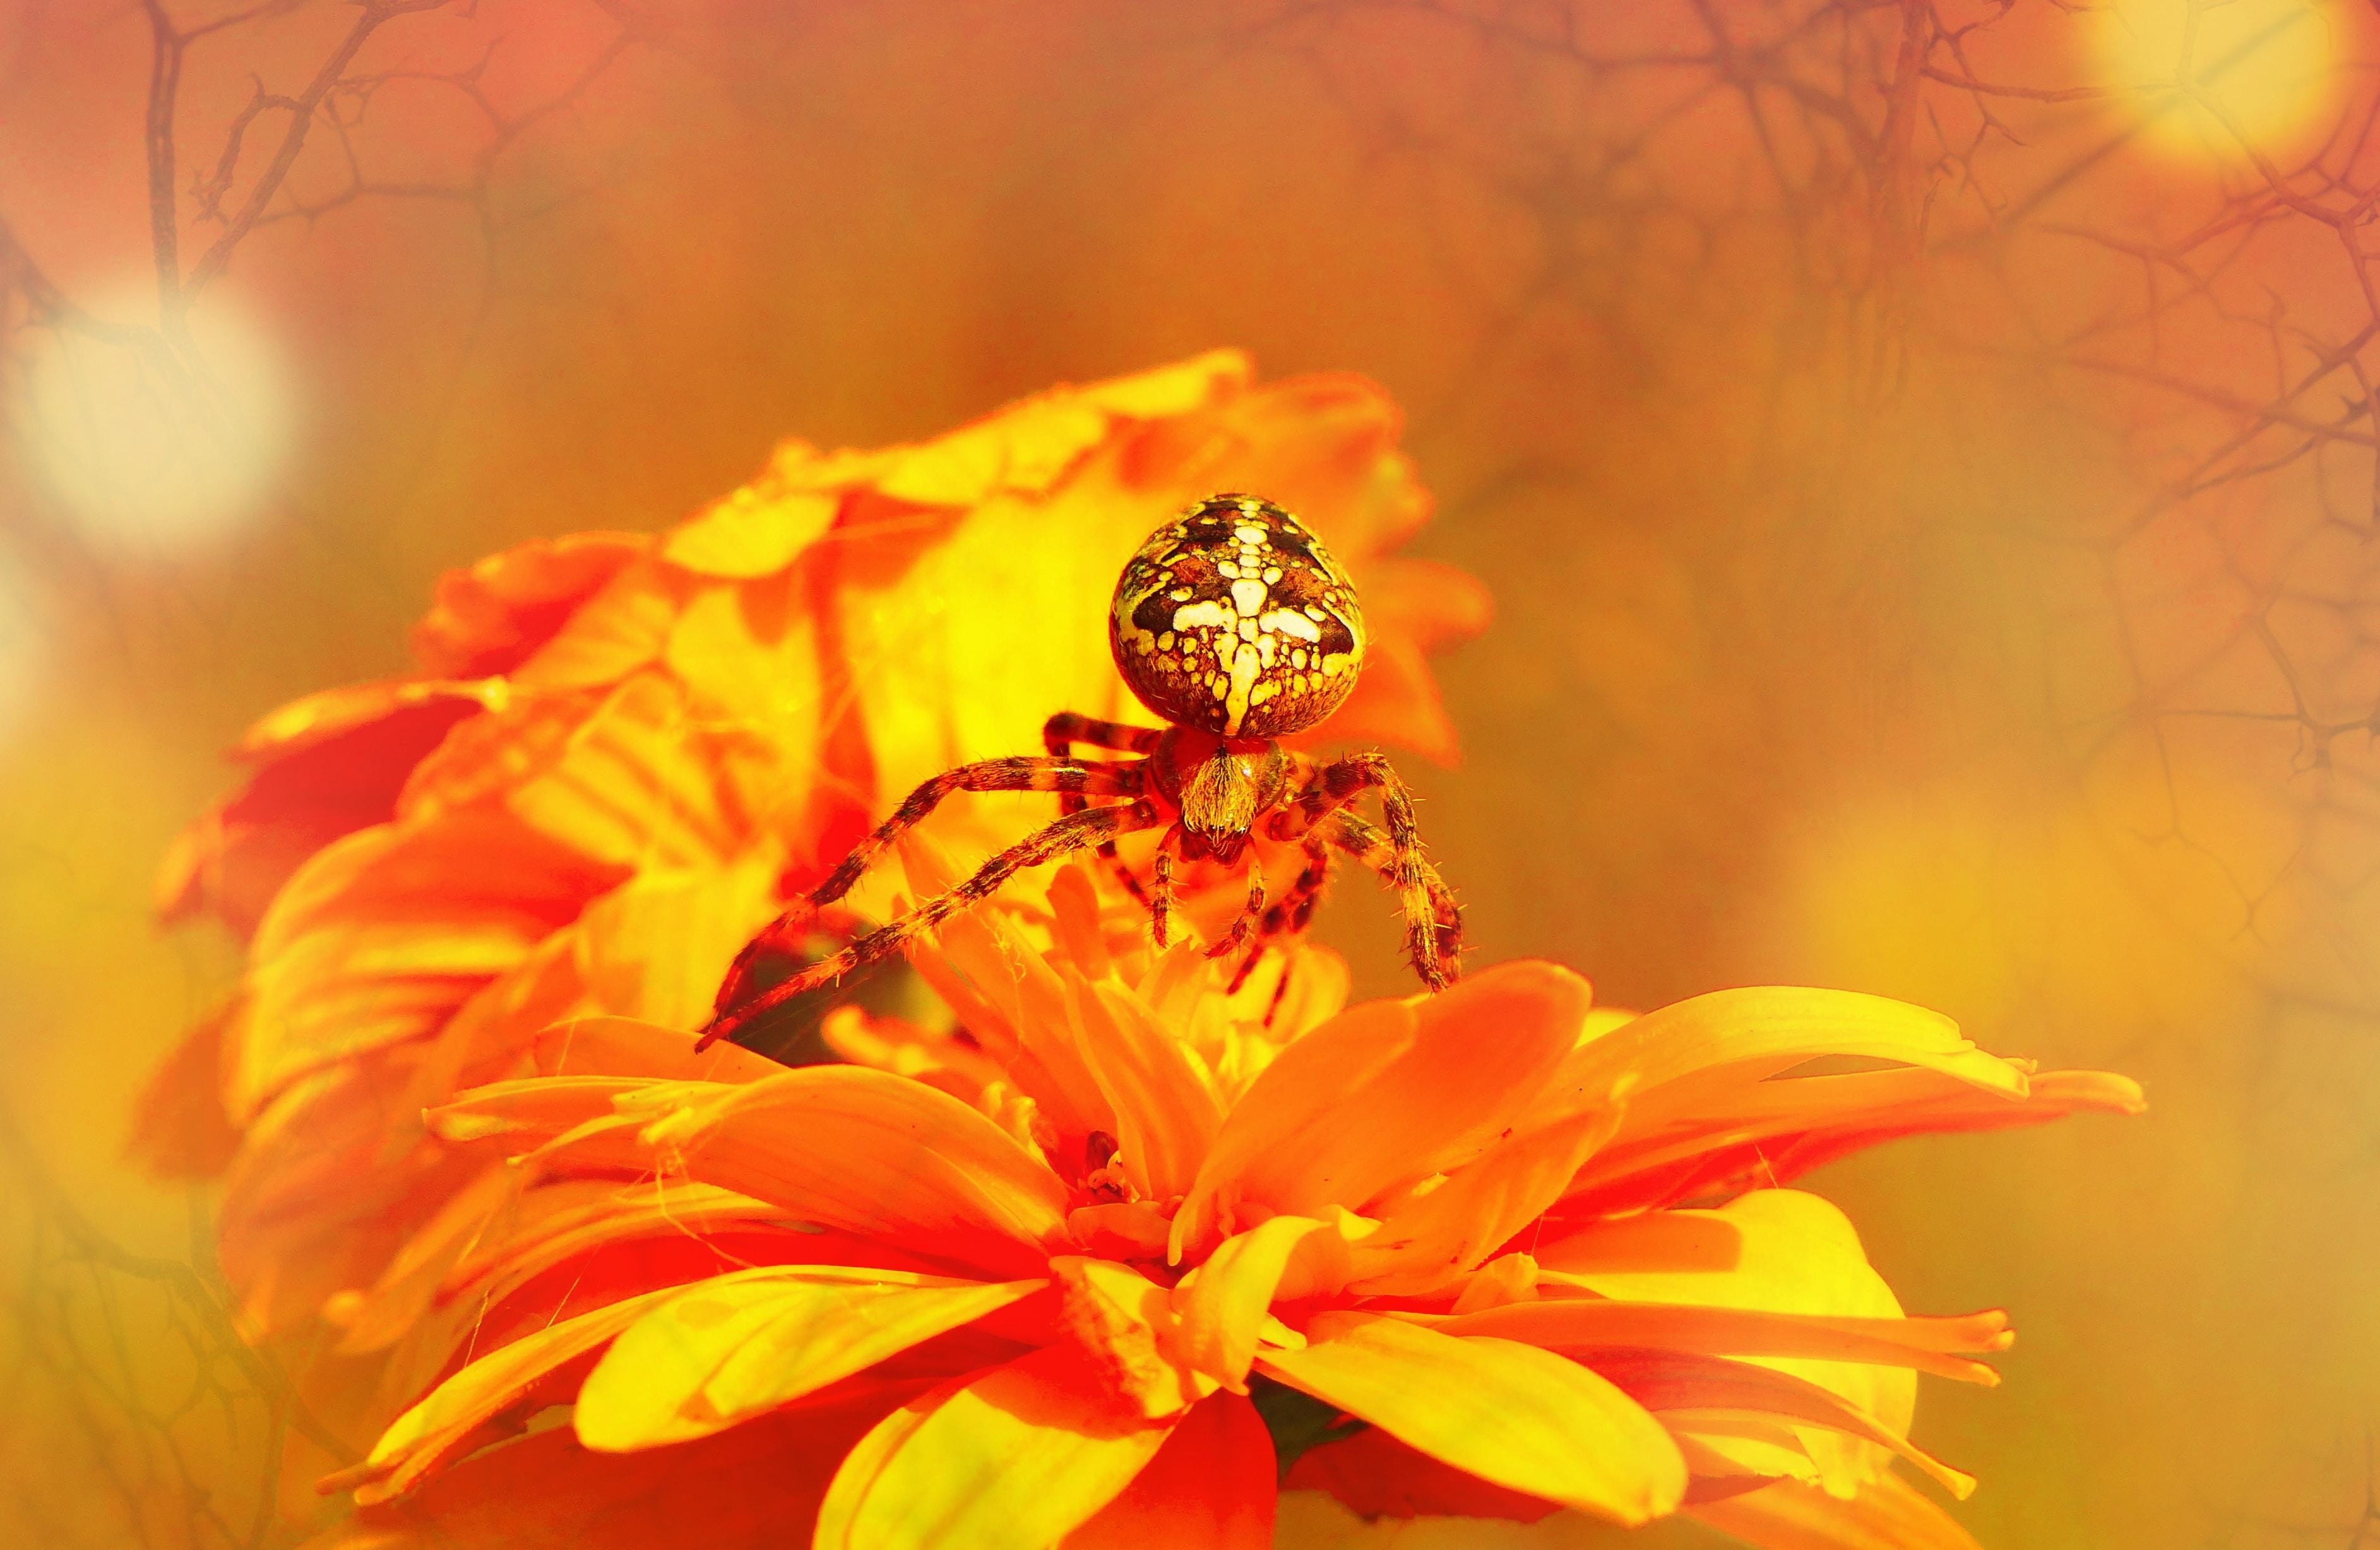 macro photography of spider on orange flowers